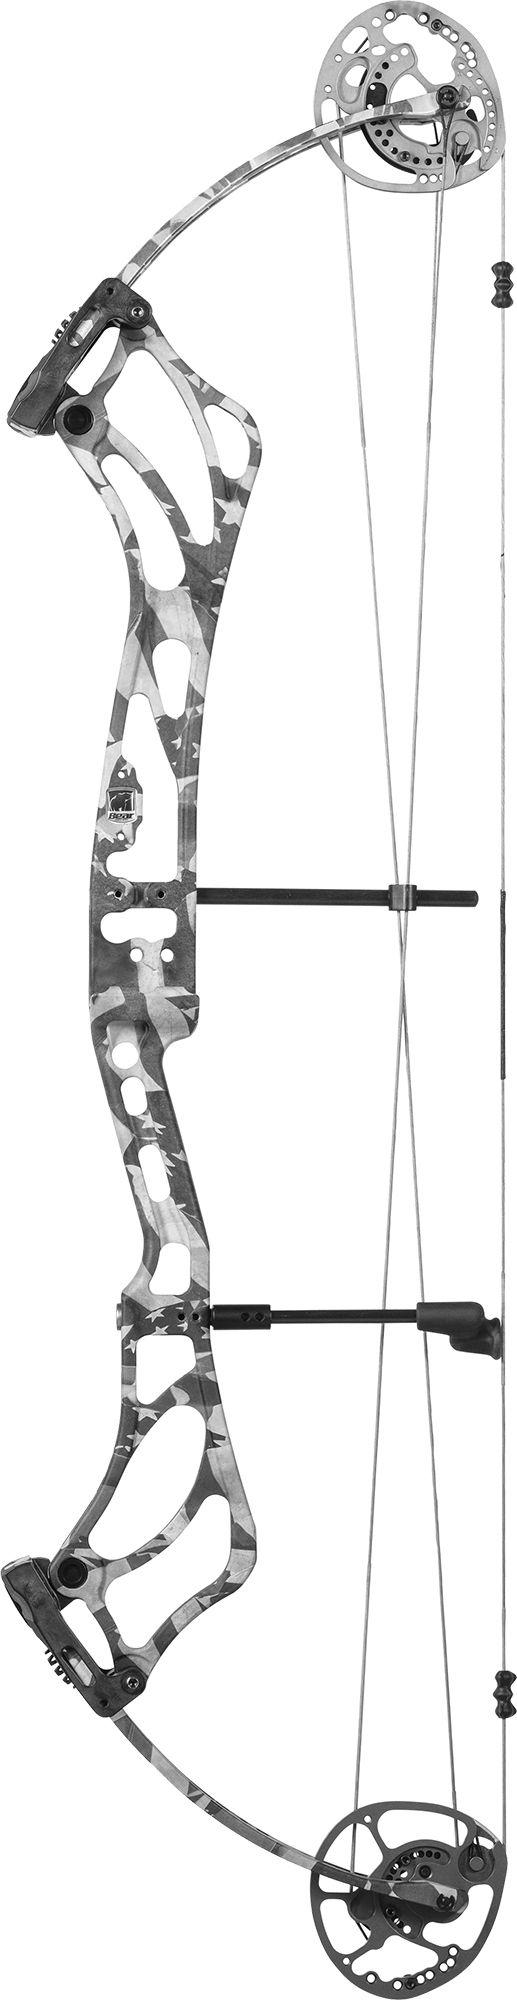 Bear Archery Revival Compound Bow, Left Hand thumbnail